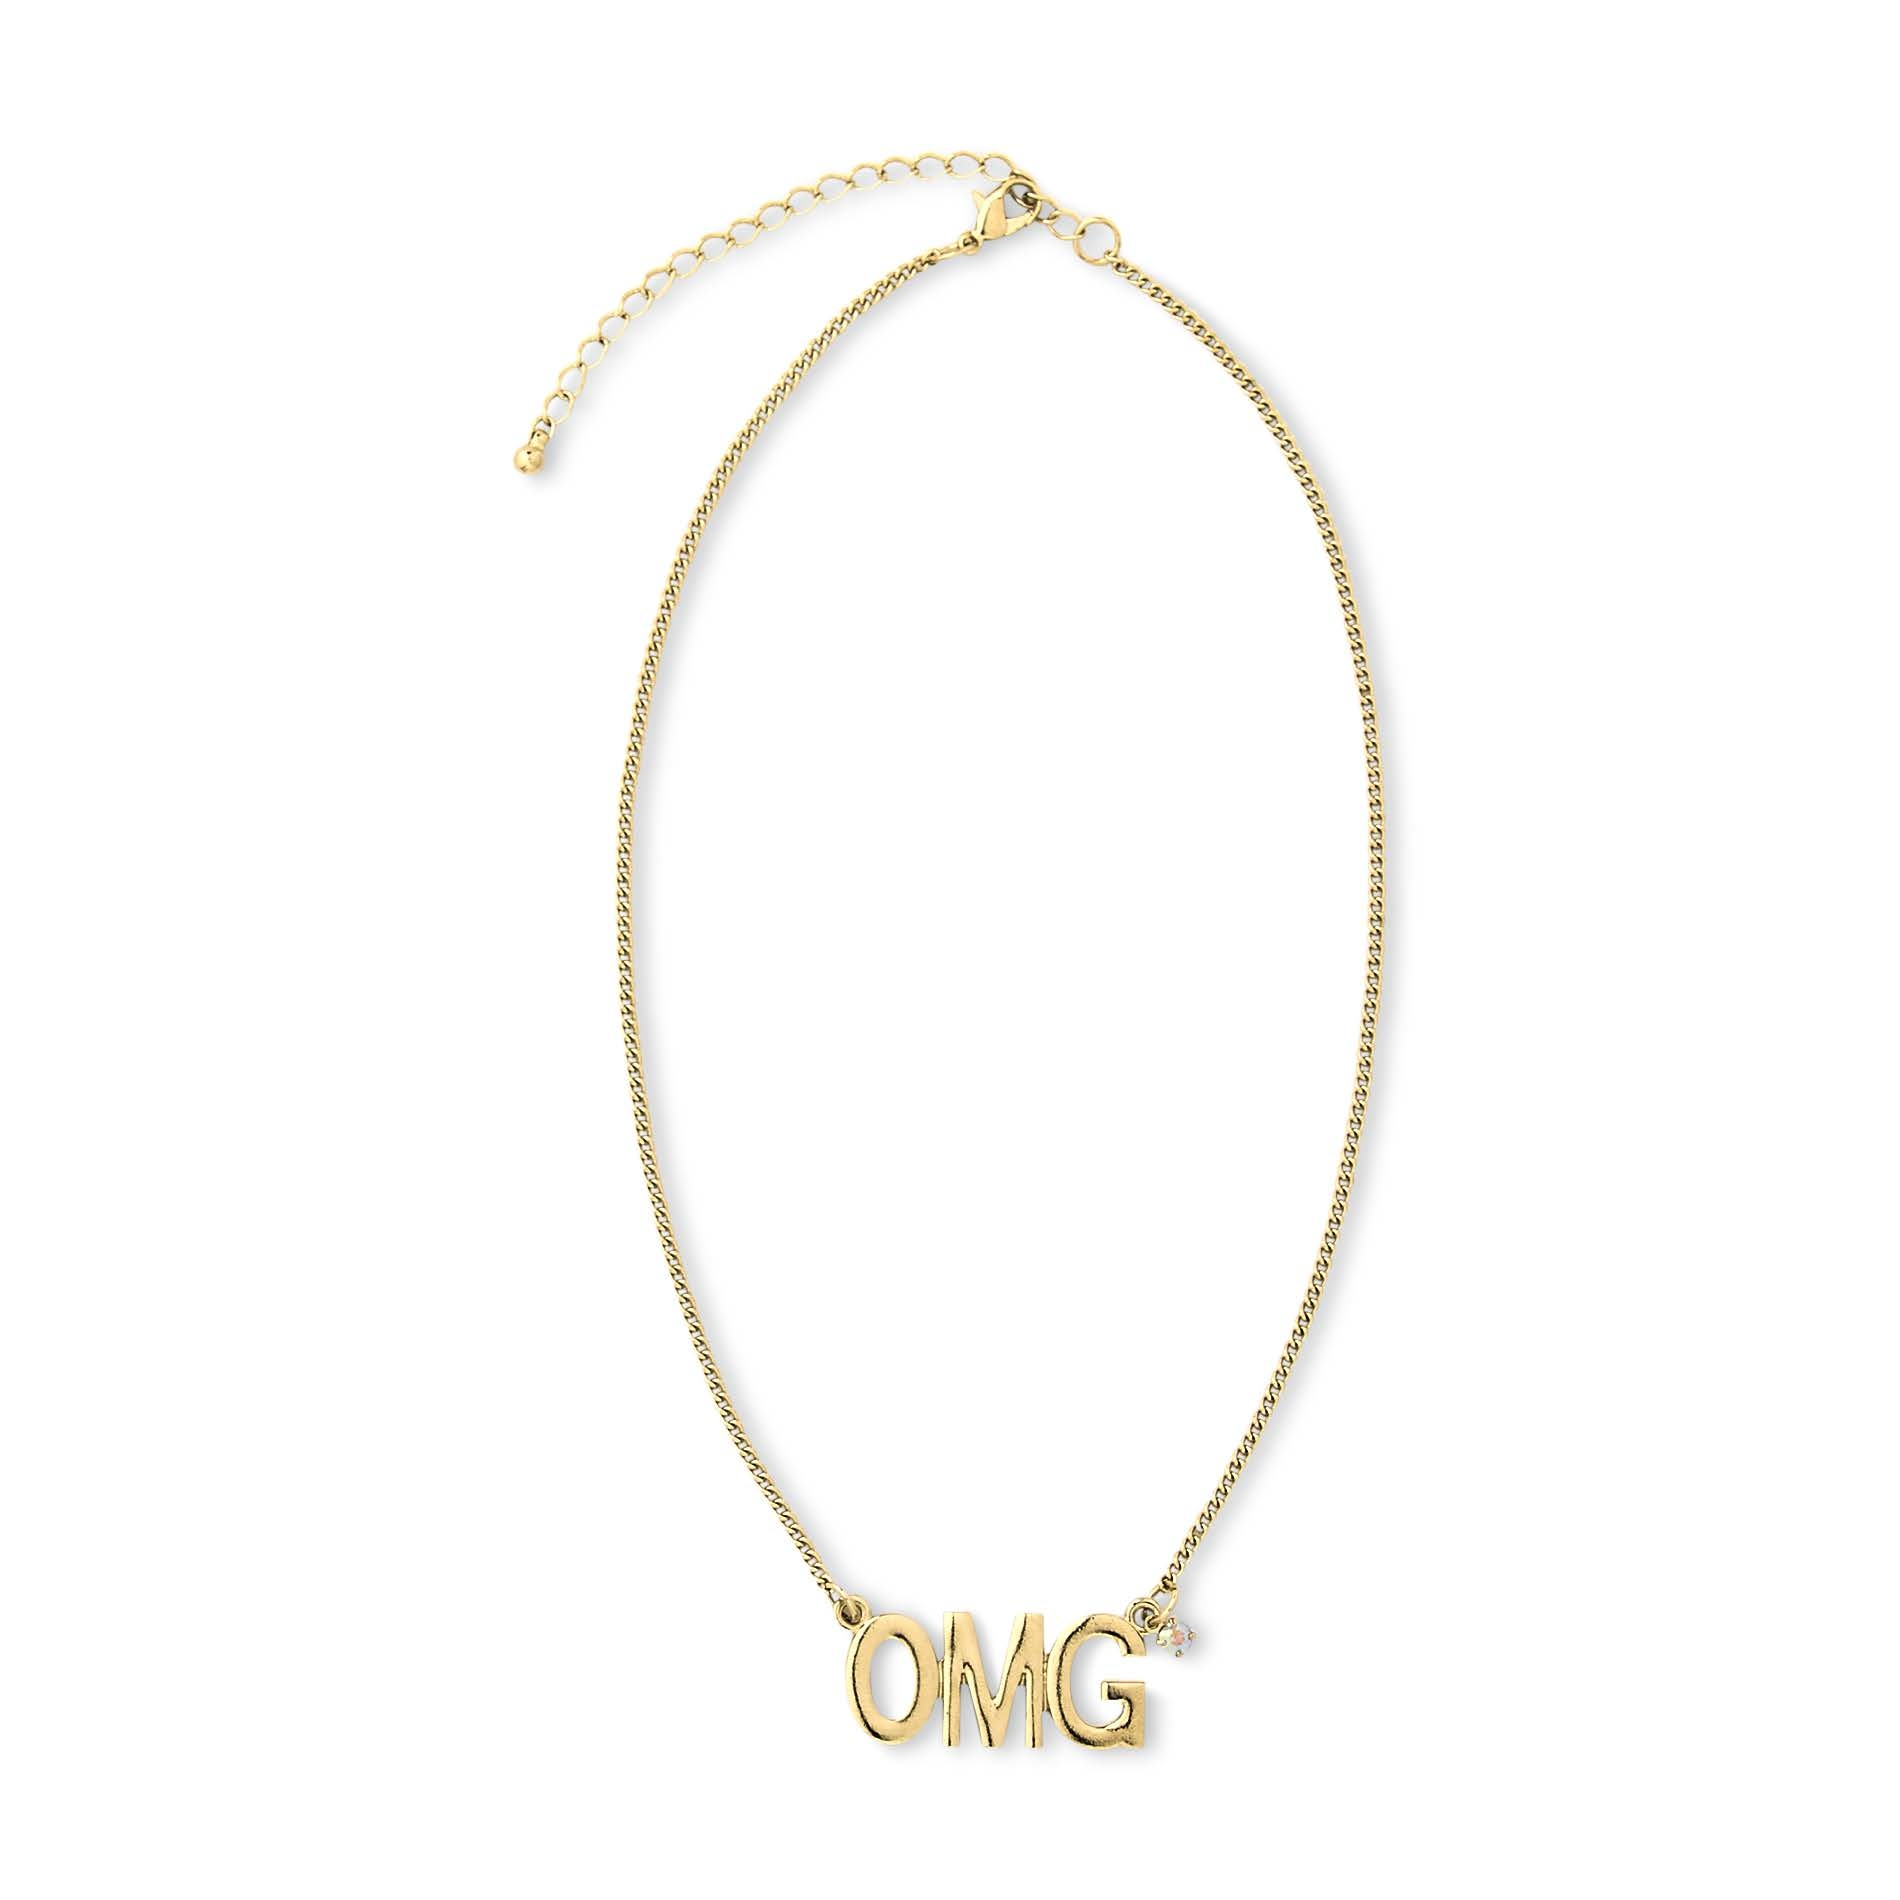 OMG and Rhinestone Pendant Necklace ($5)